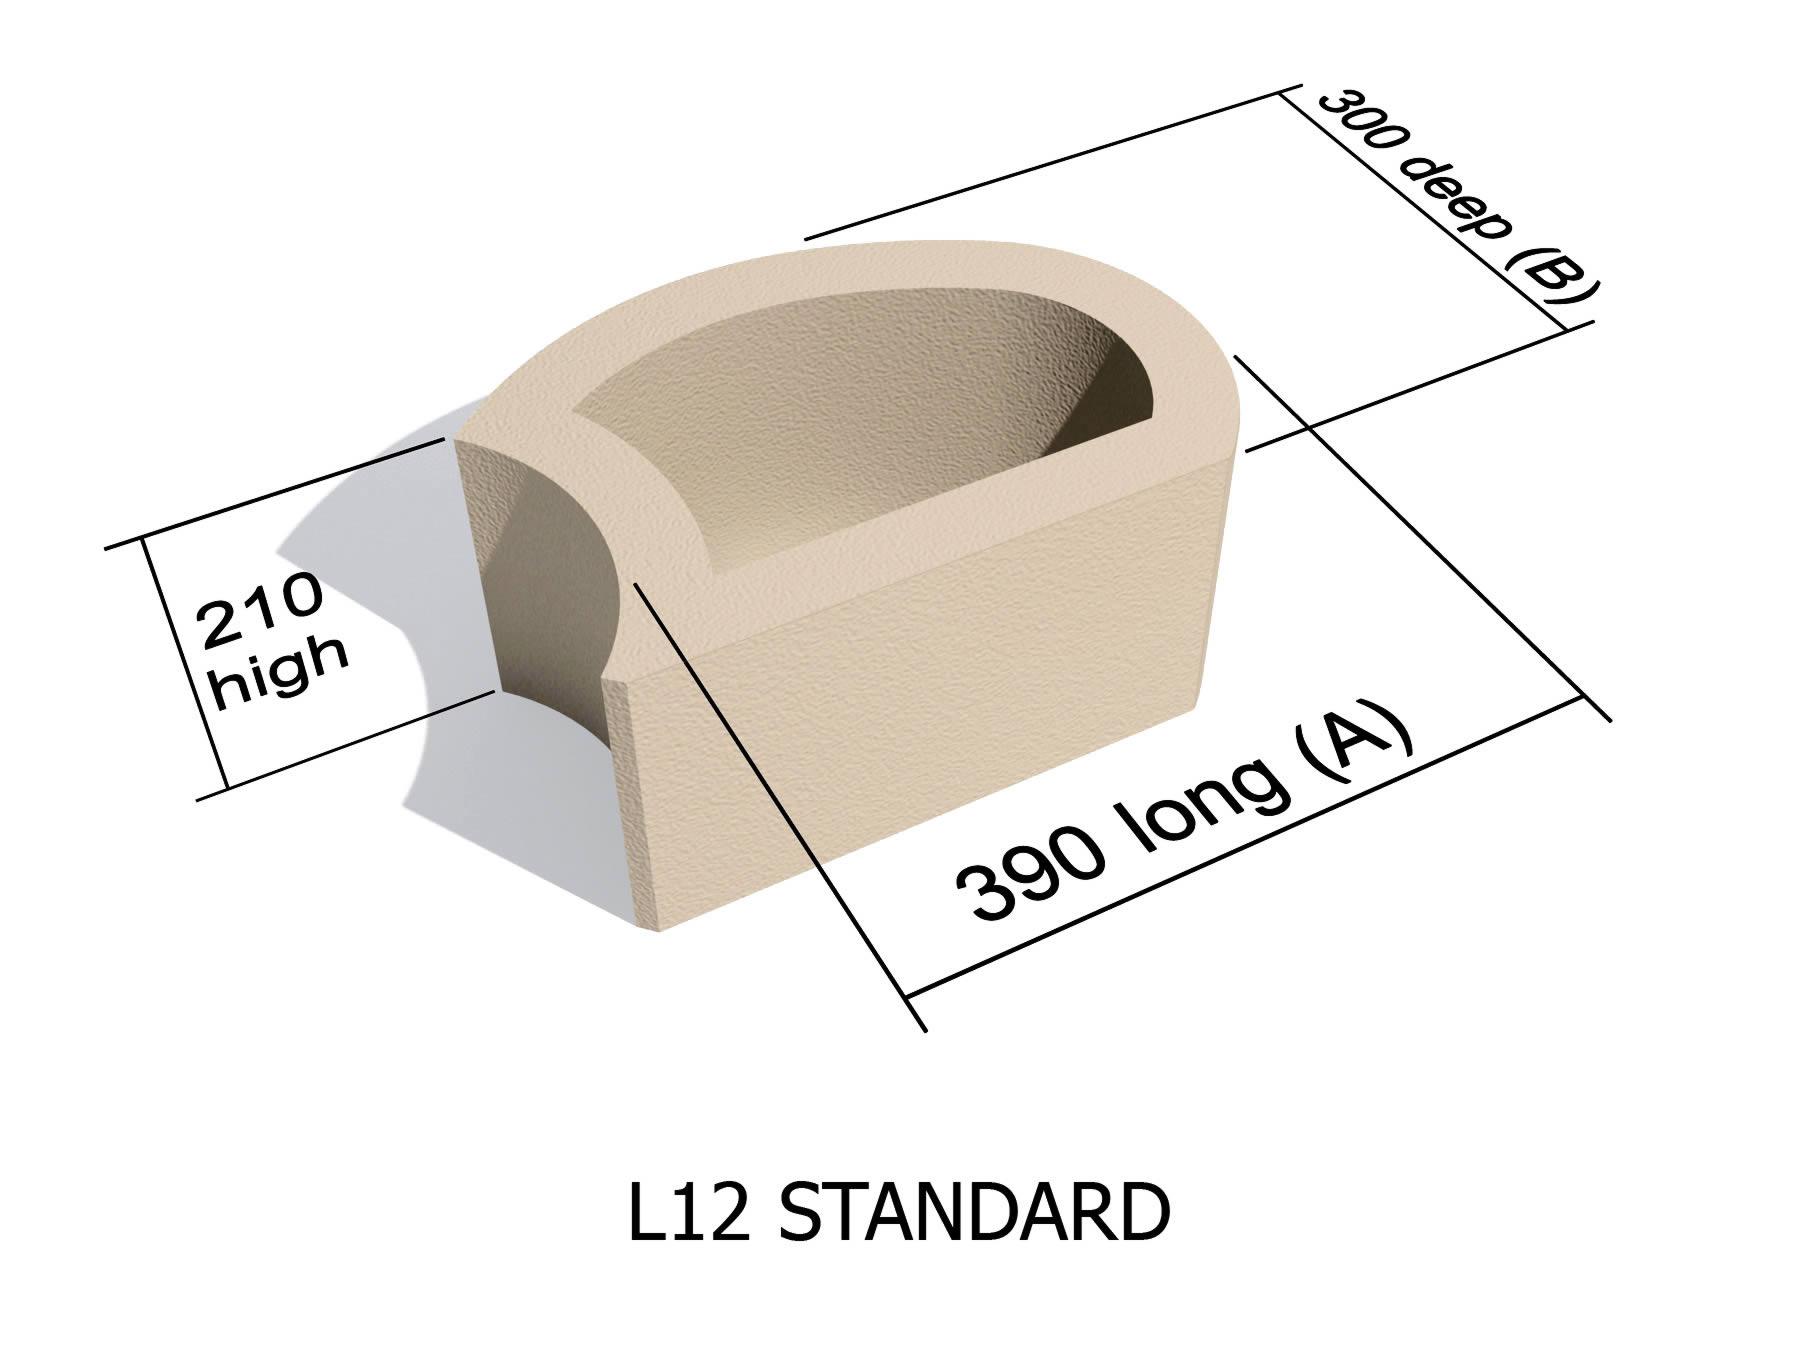 L12 block